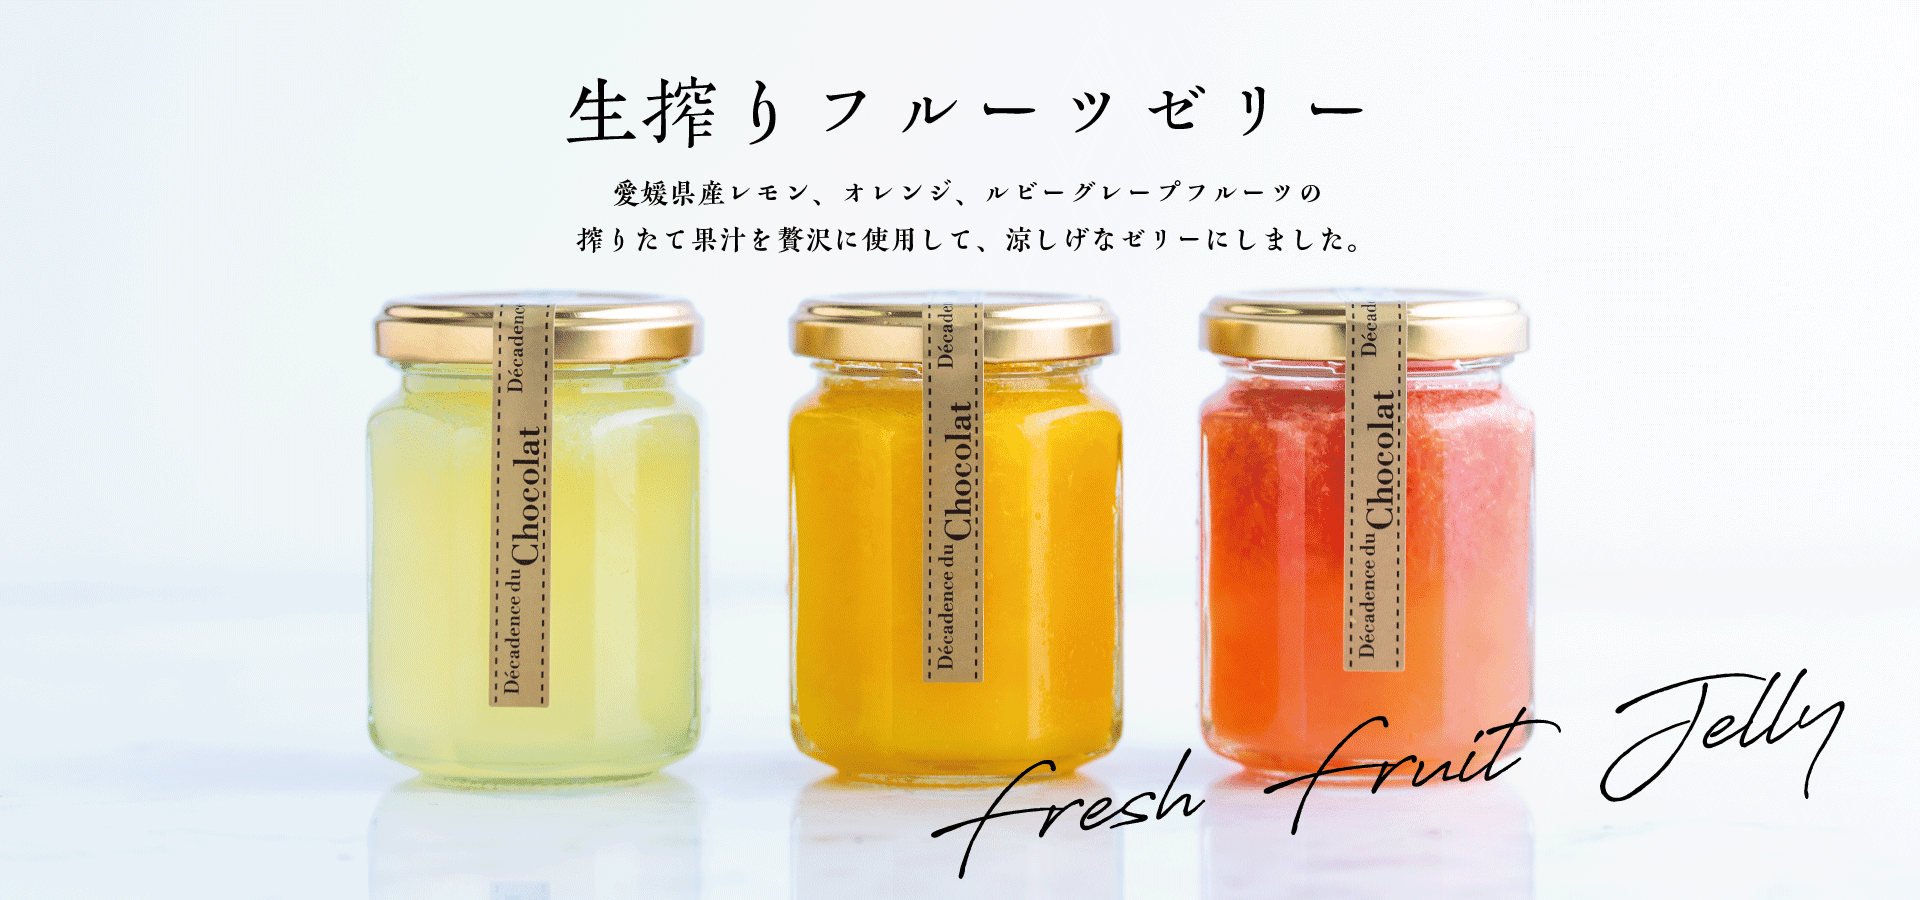 New Items/新商品